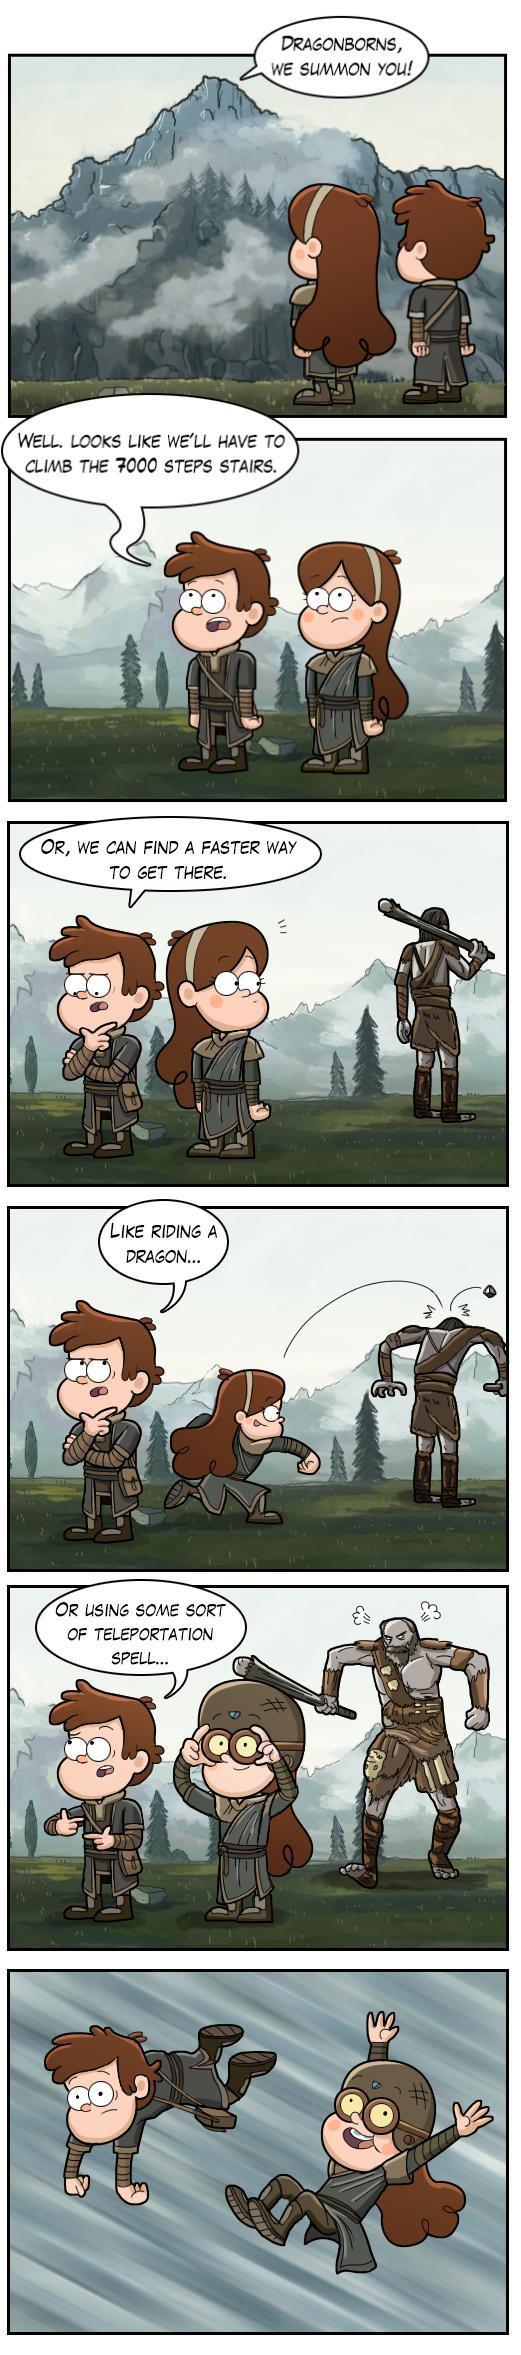 Dragonborns, we summon you! - meme